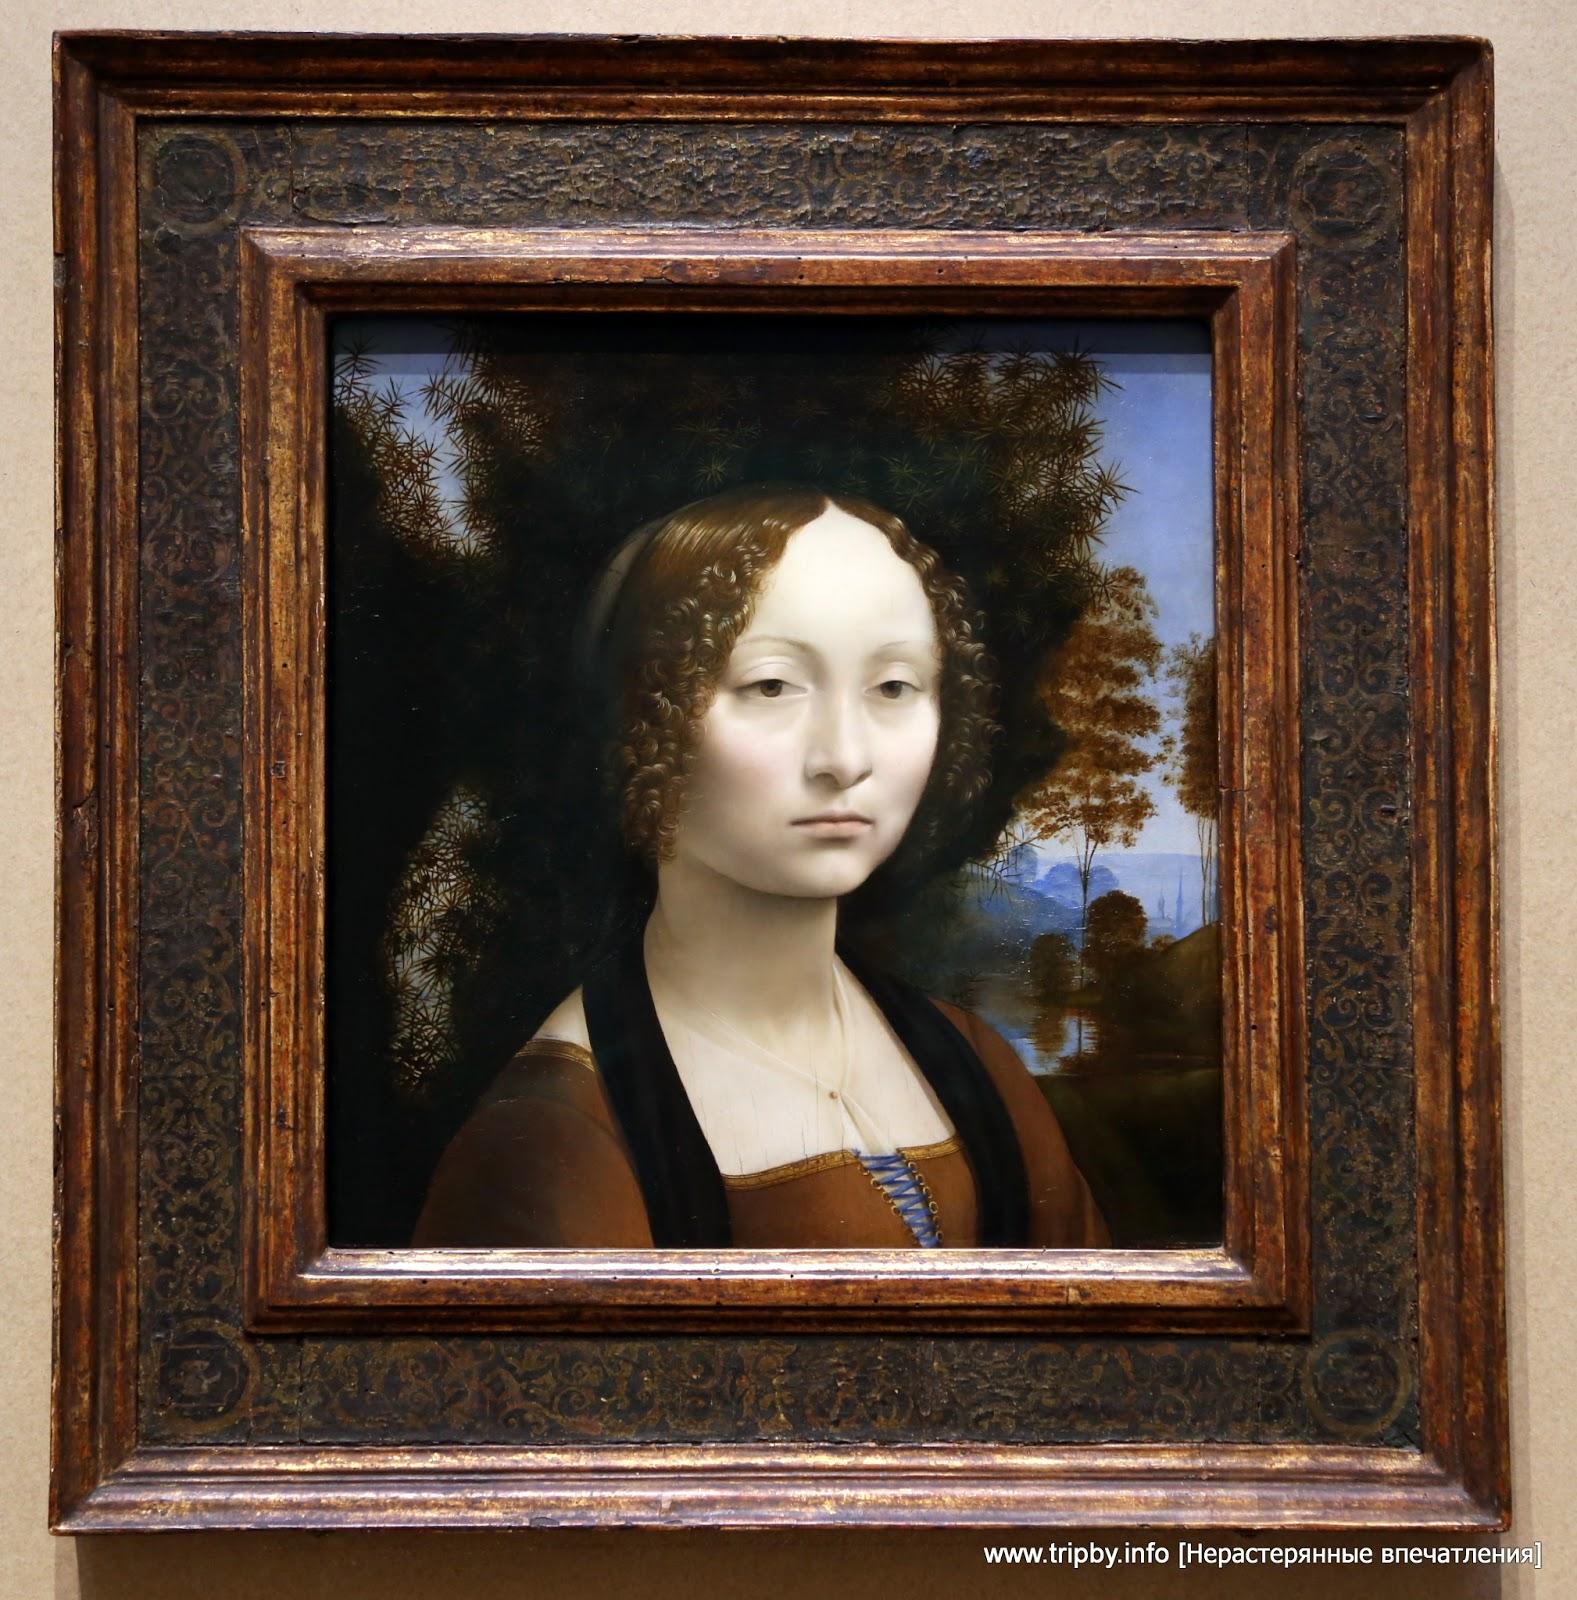 Джиневра Бенчи. Леонардо да Винчи || Leonardo da Vinci Florentine, 1452 - 1519 Ginevra de' Benci